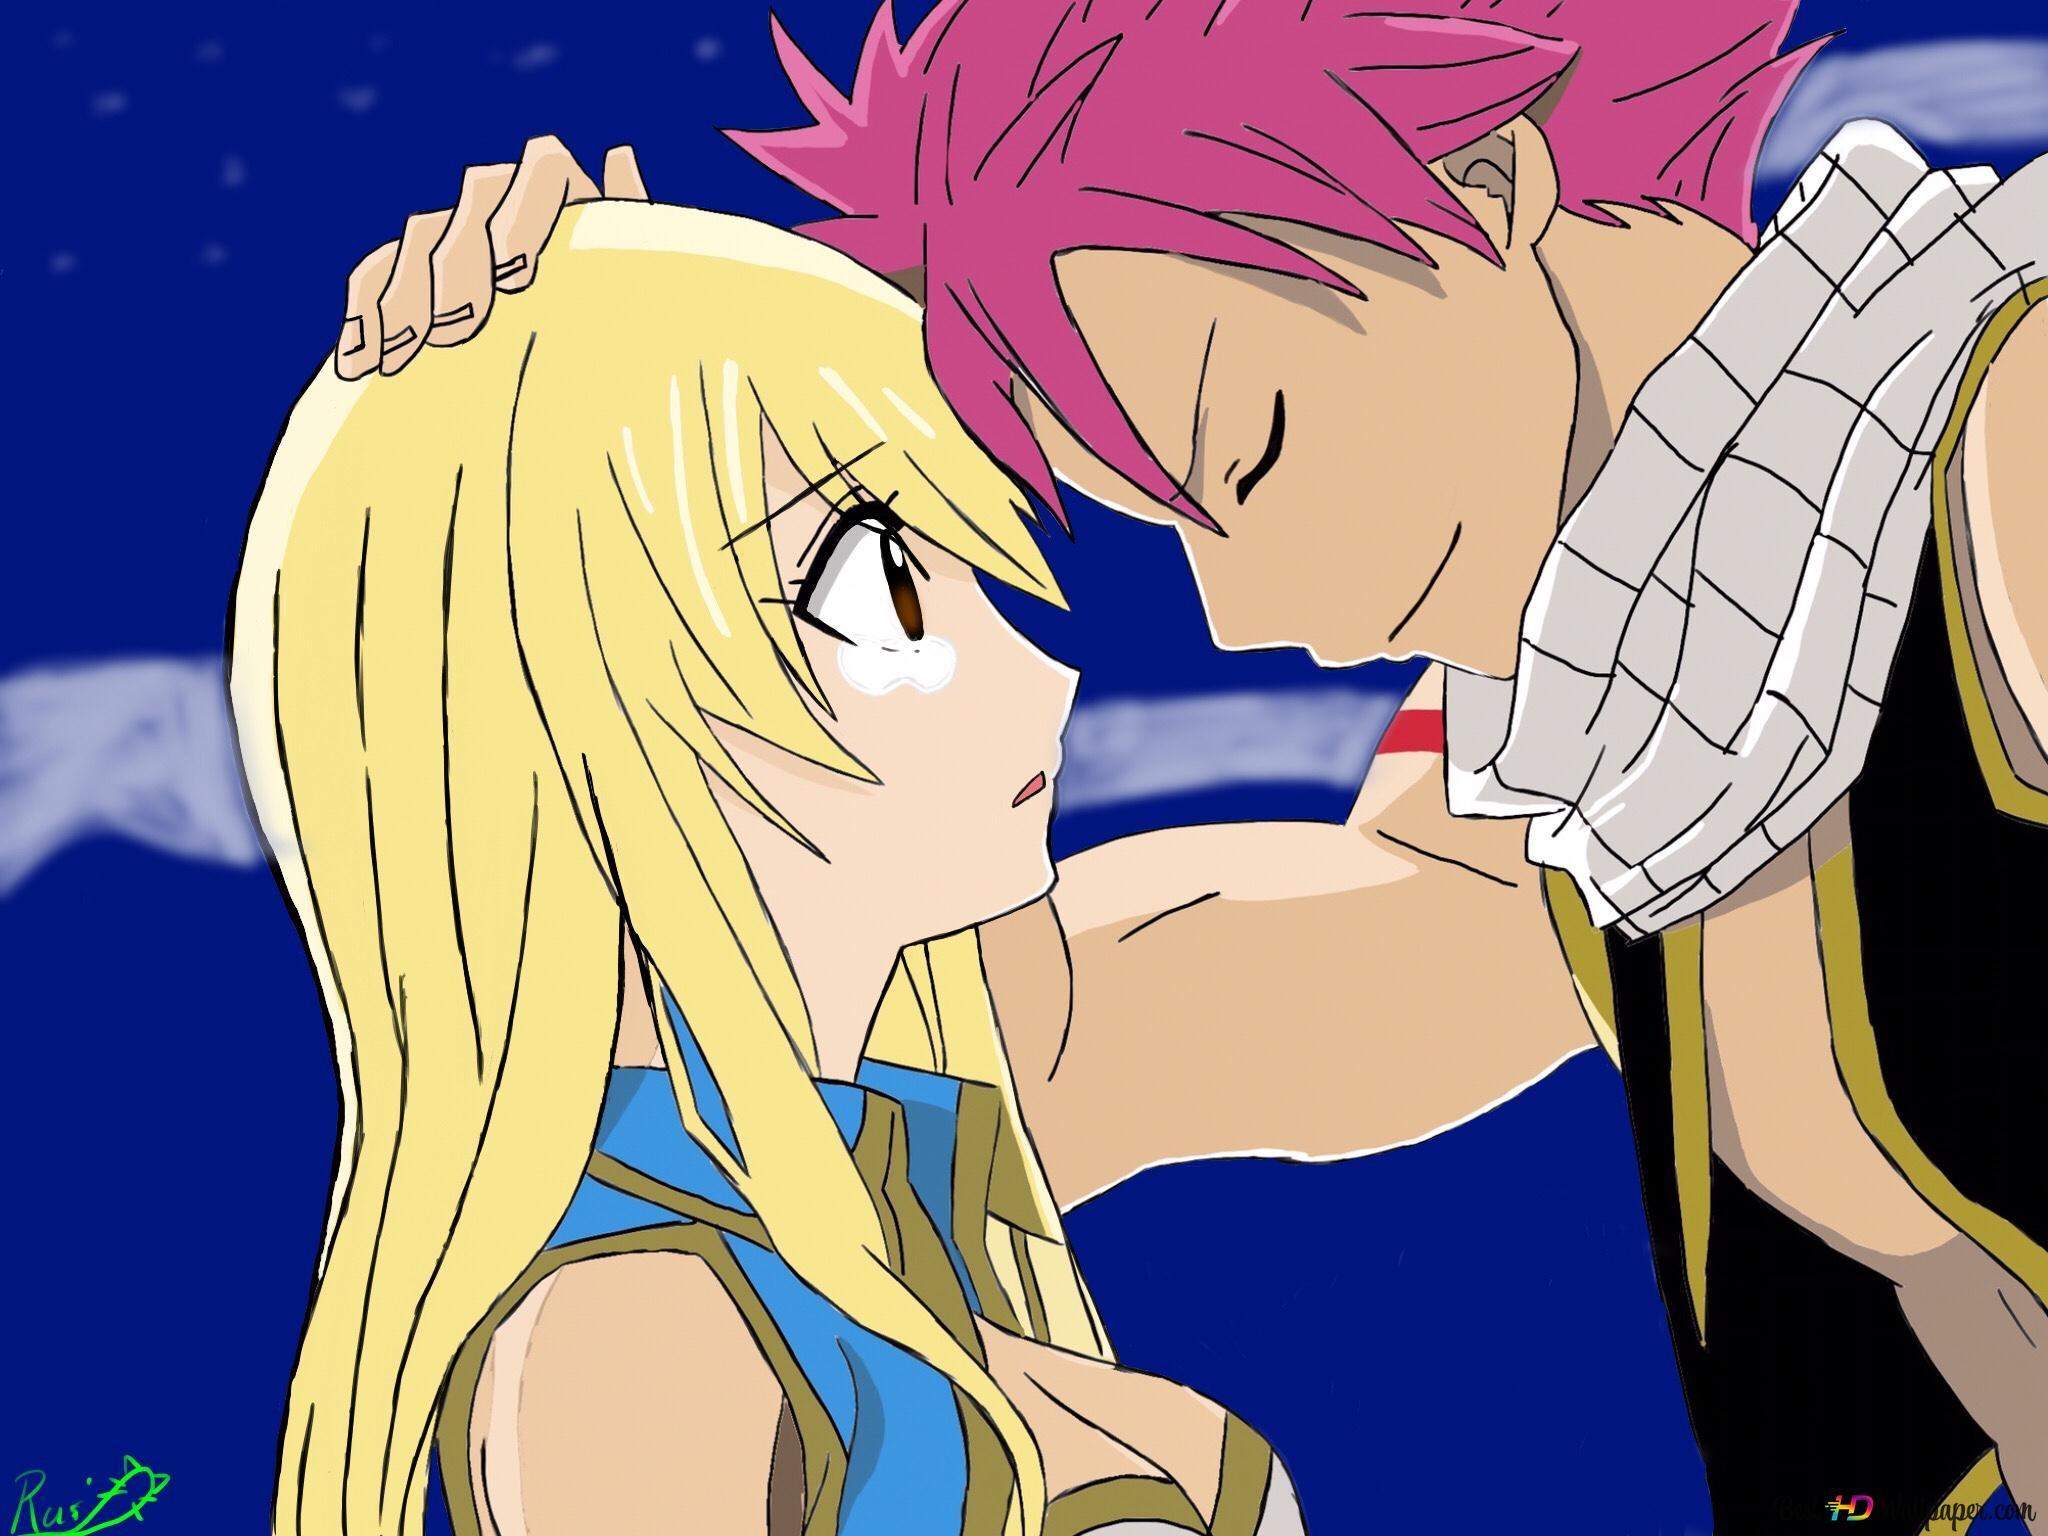 Fairy Tail Lucy Heartfilia Natsu Dragneel Hd